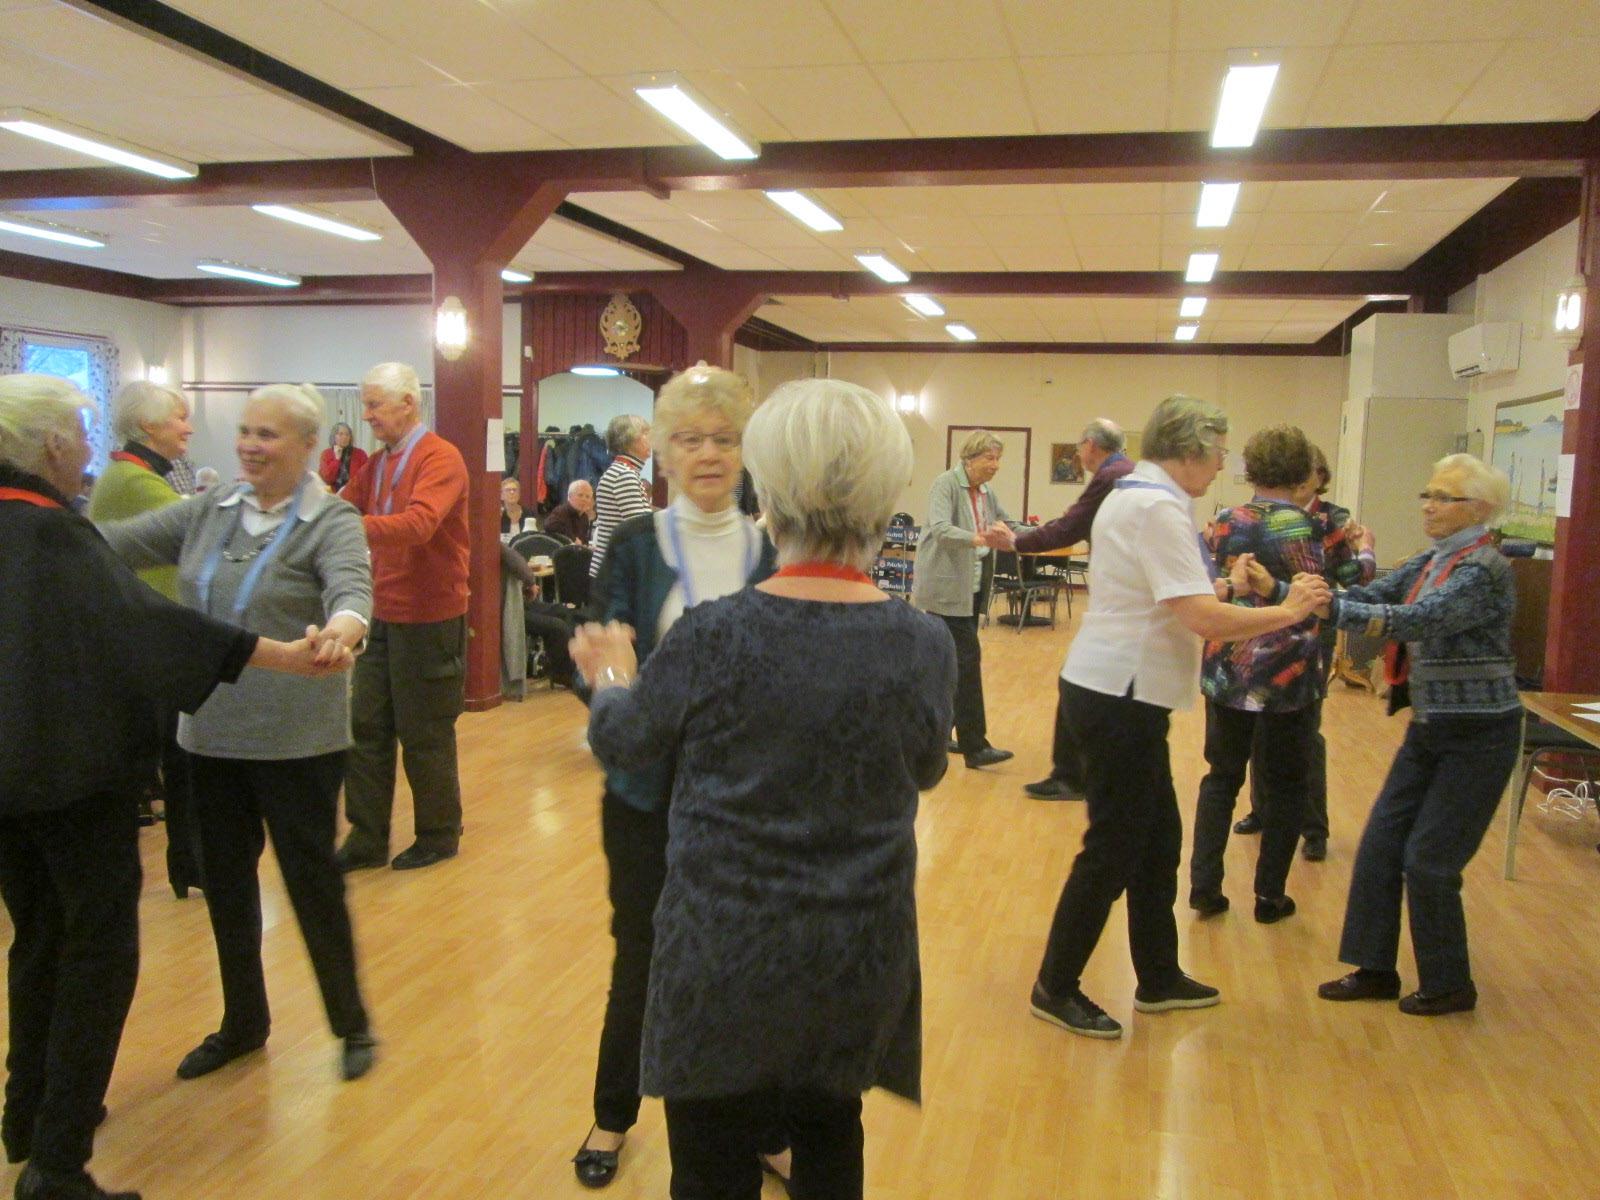 Dansarna visar olika seniordansturer